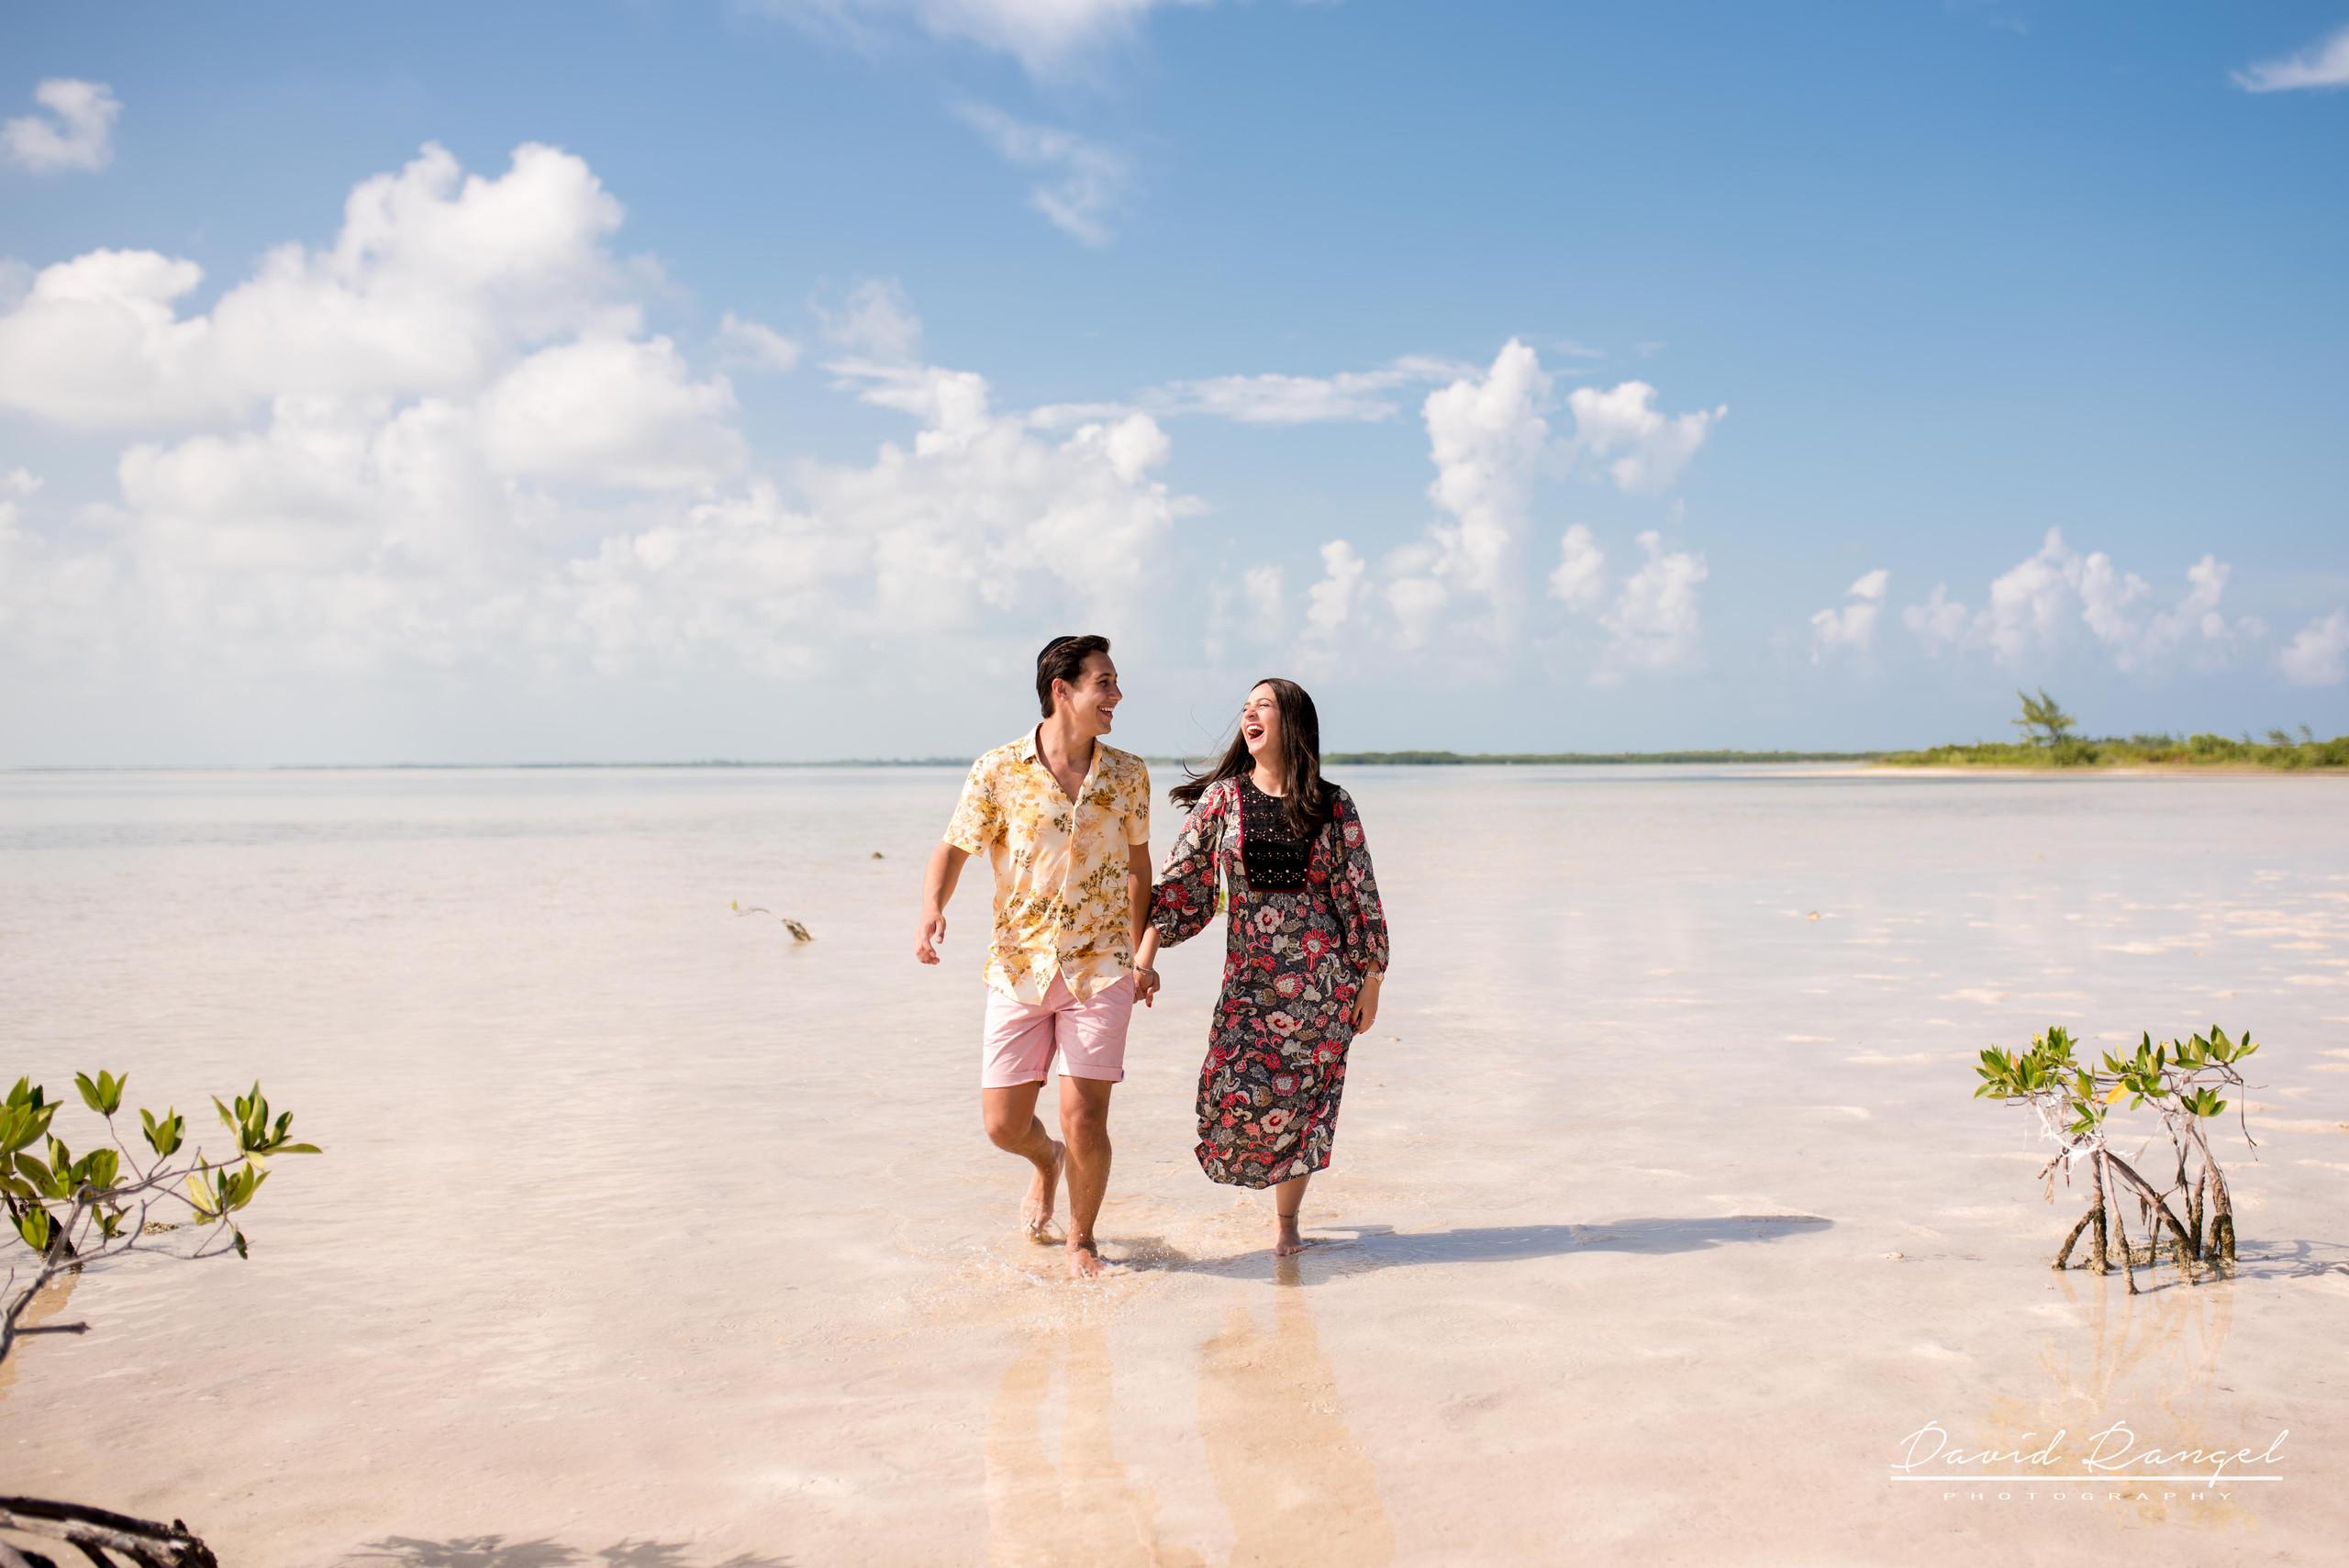 couple+happy+love+together+destination+photographer+photo+beach+caribe+cancun+honeymoon+celebration+isla+blanca